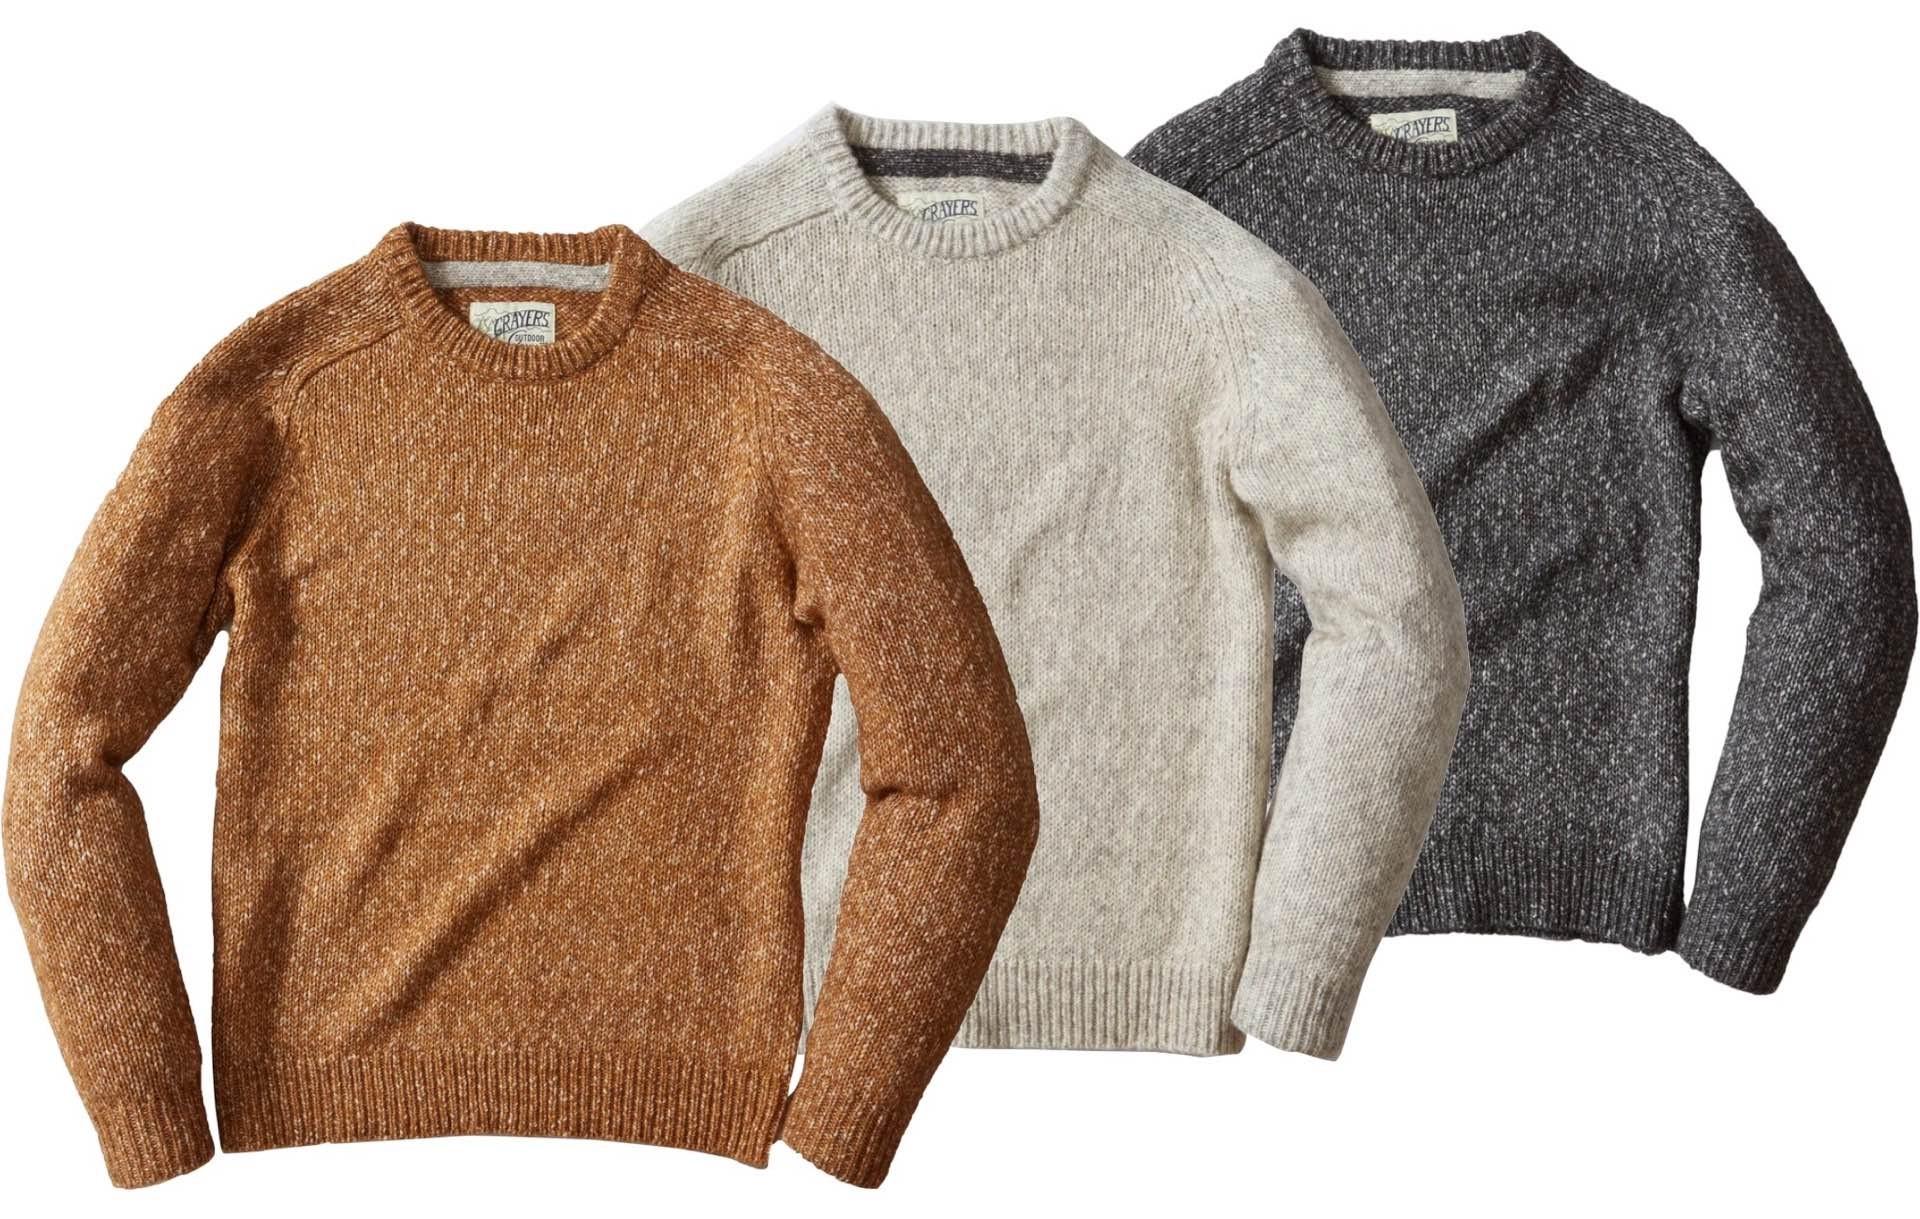 Grayers raglan-sleeved crewneck sweaters. ($165 each)